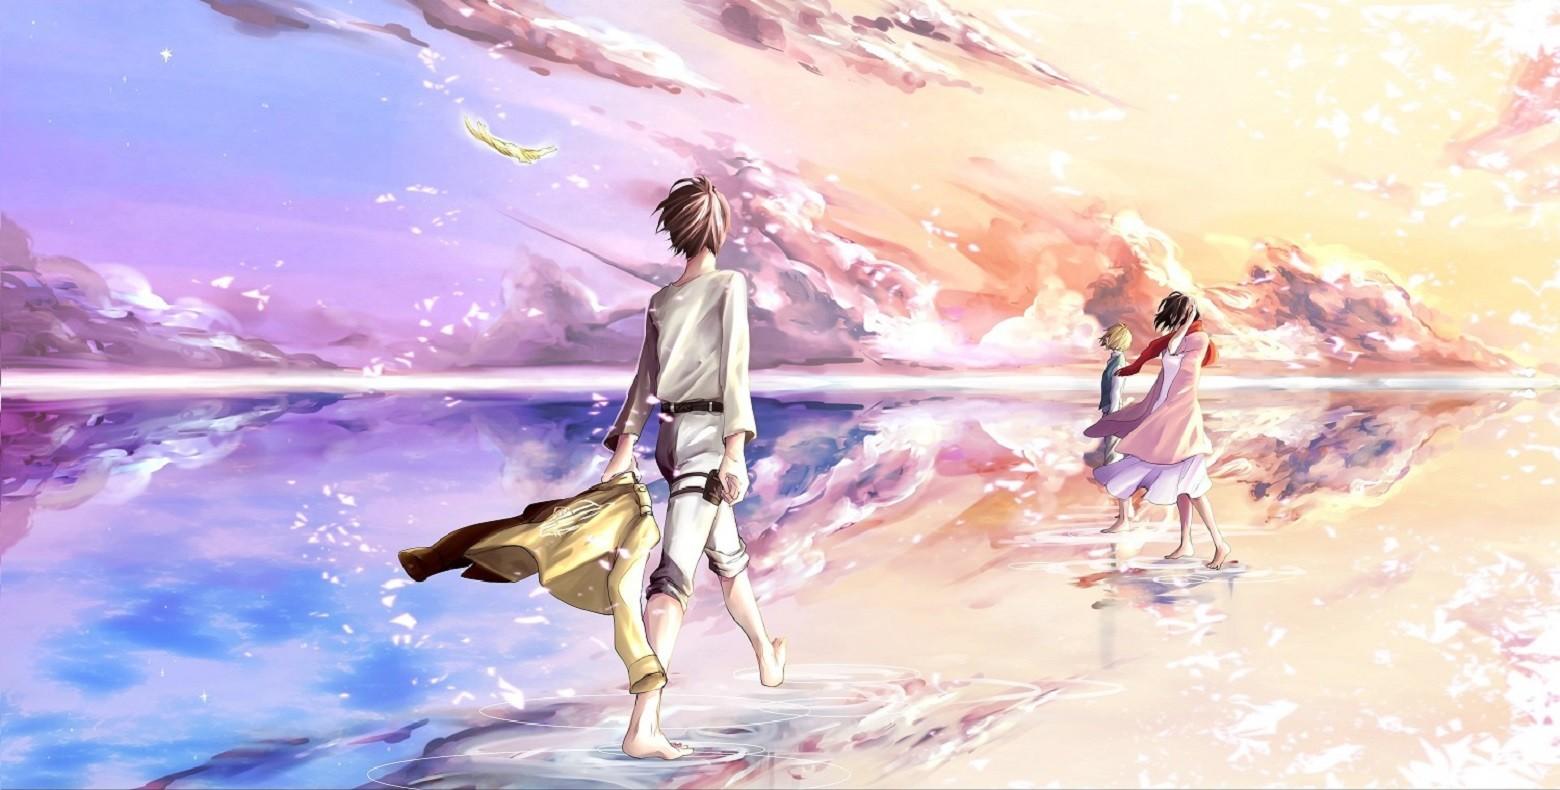 Wallpaper Landscape Illustration Anime Girls Sky Shingeki No Kyojin Eren Jeager Mikasa Ackerman Mythology Armin Arlert Screenshot Computer Wallpaper 1560x790 Jack3571 220956 Hd Wallpapers Wallhere